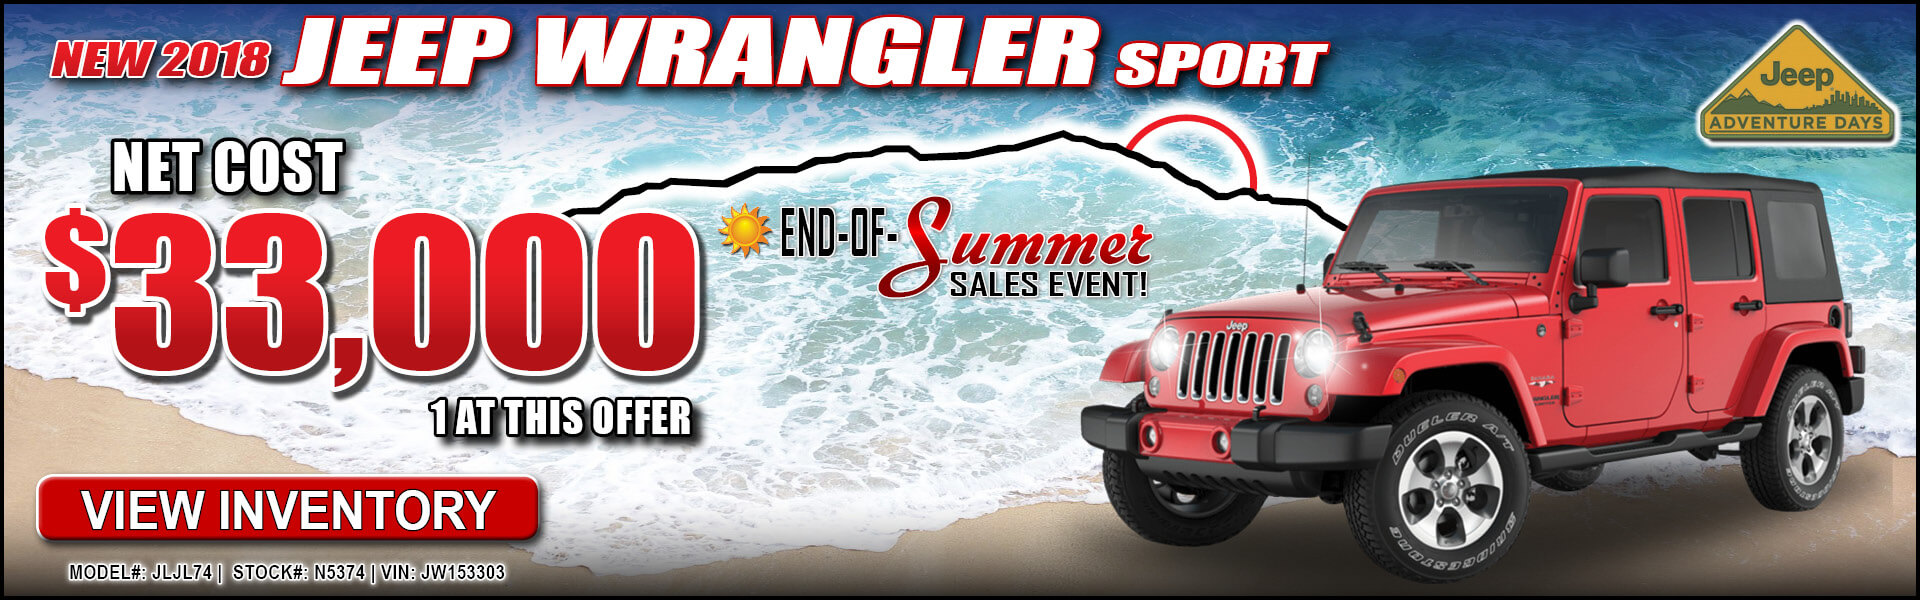 Jeep Wrangler Sport $33,000